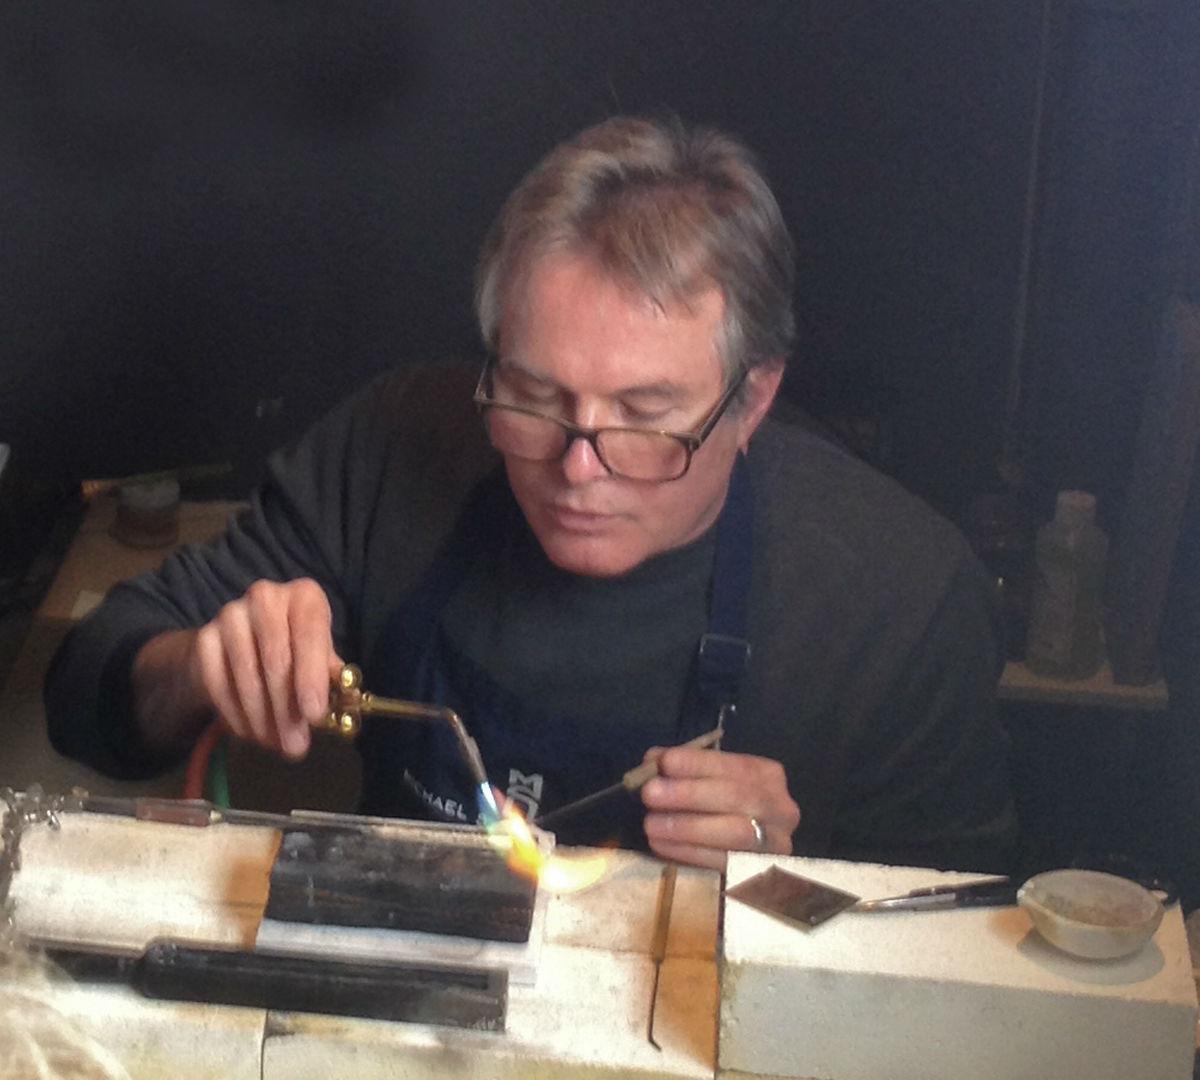 Michael Sturlin soldering jewelry